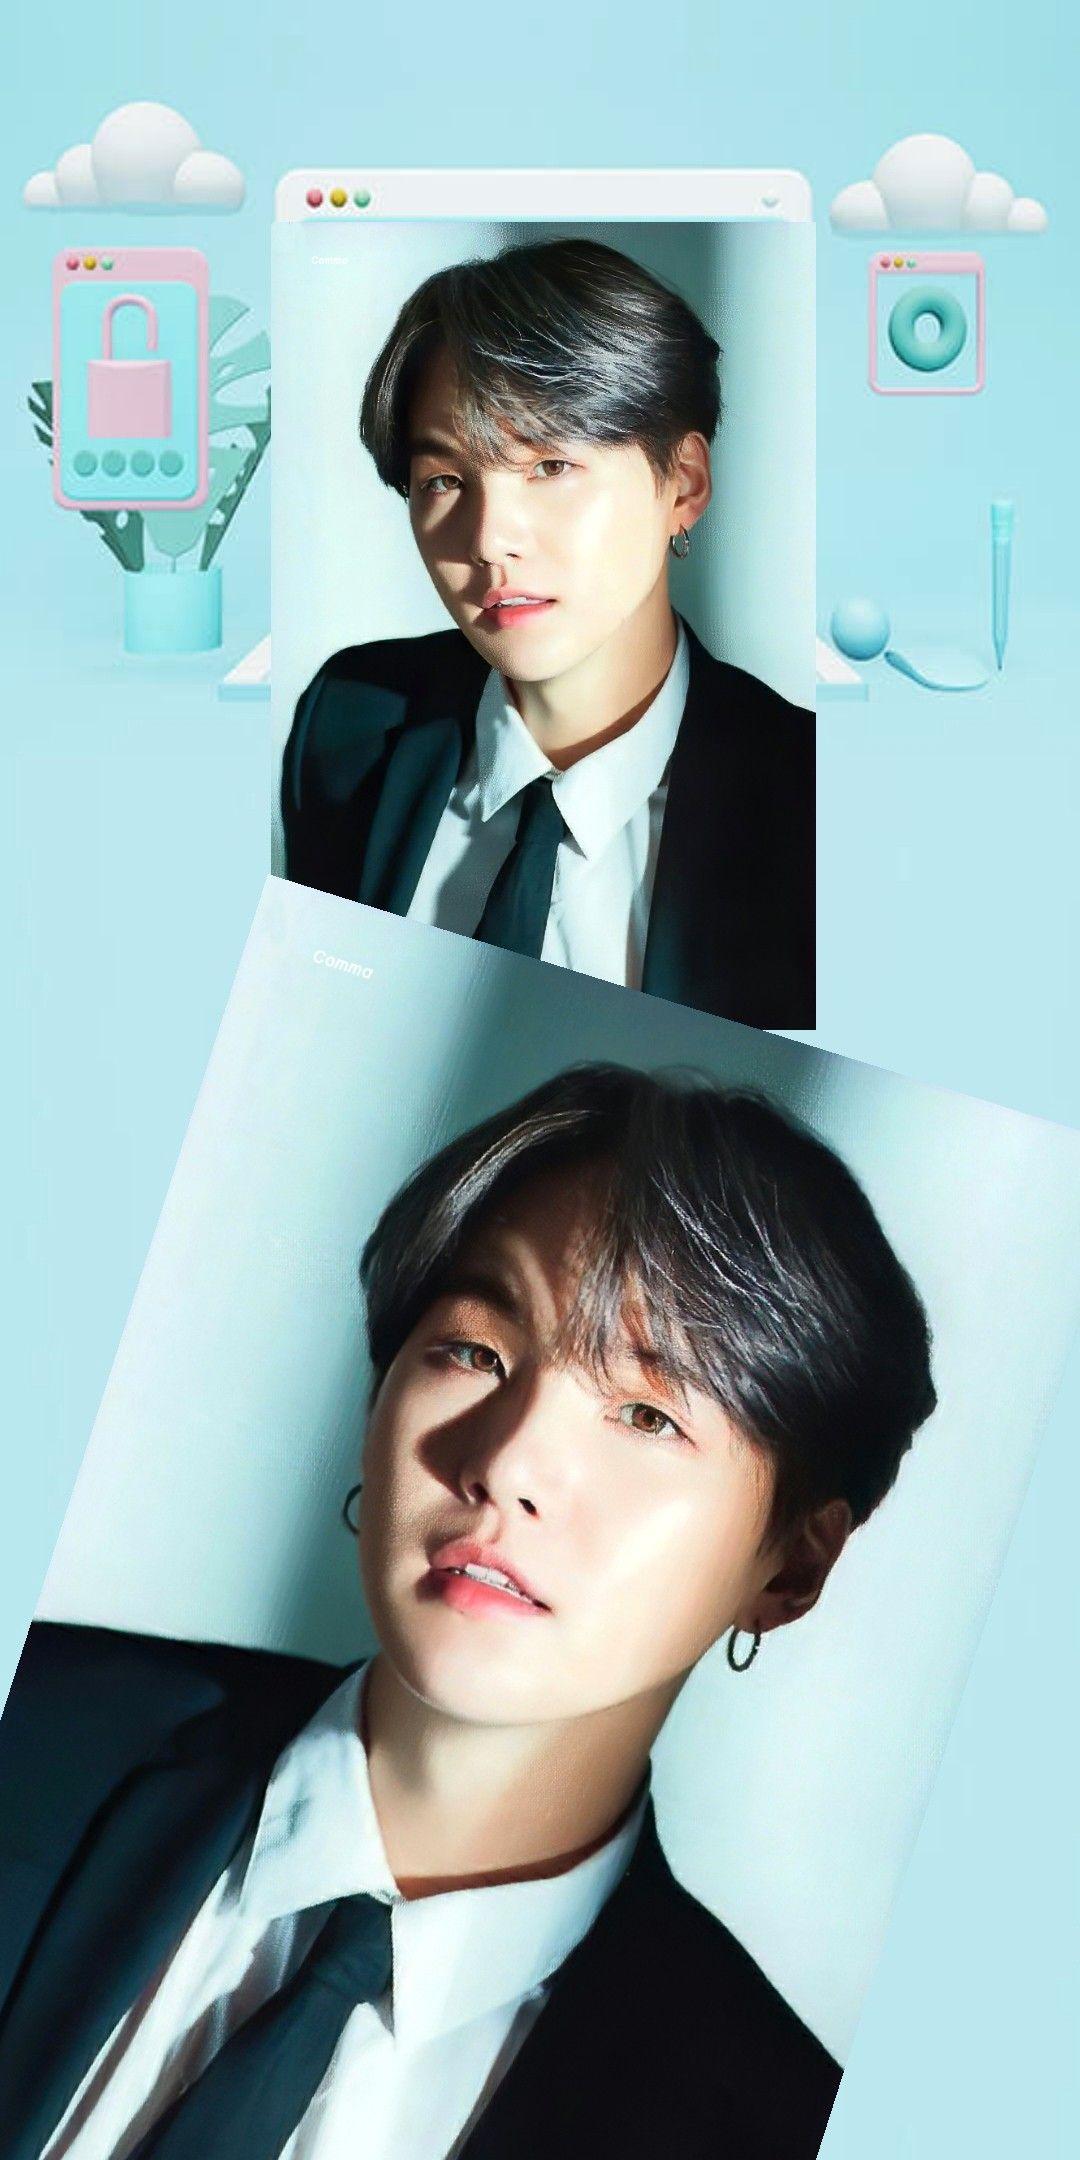 Min Yoongi Suga Bts Lockscreen Wallpaper 050920 Yoongi Bts Suga Min Yoongi Bts suga wallpaper lockscreen